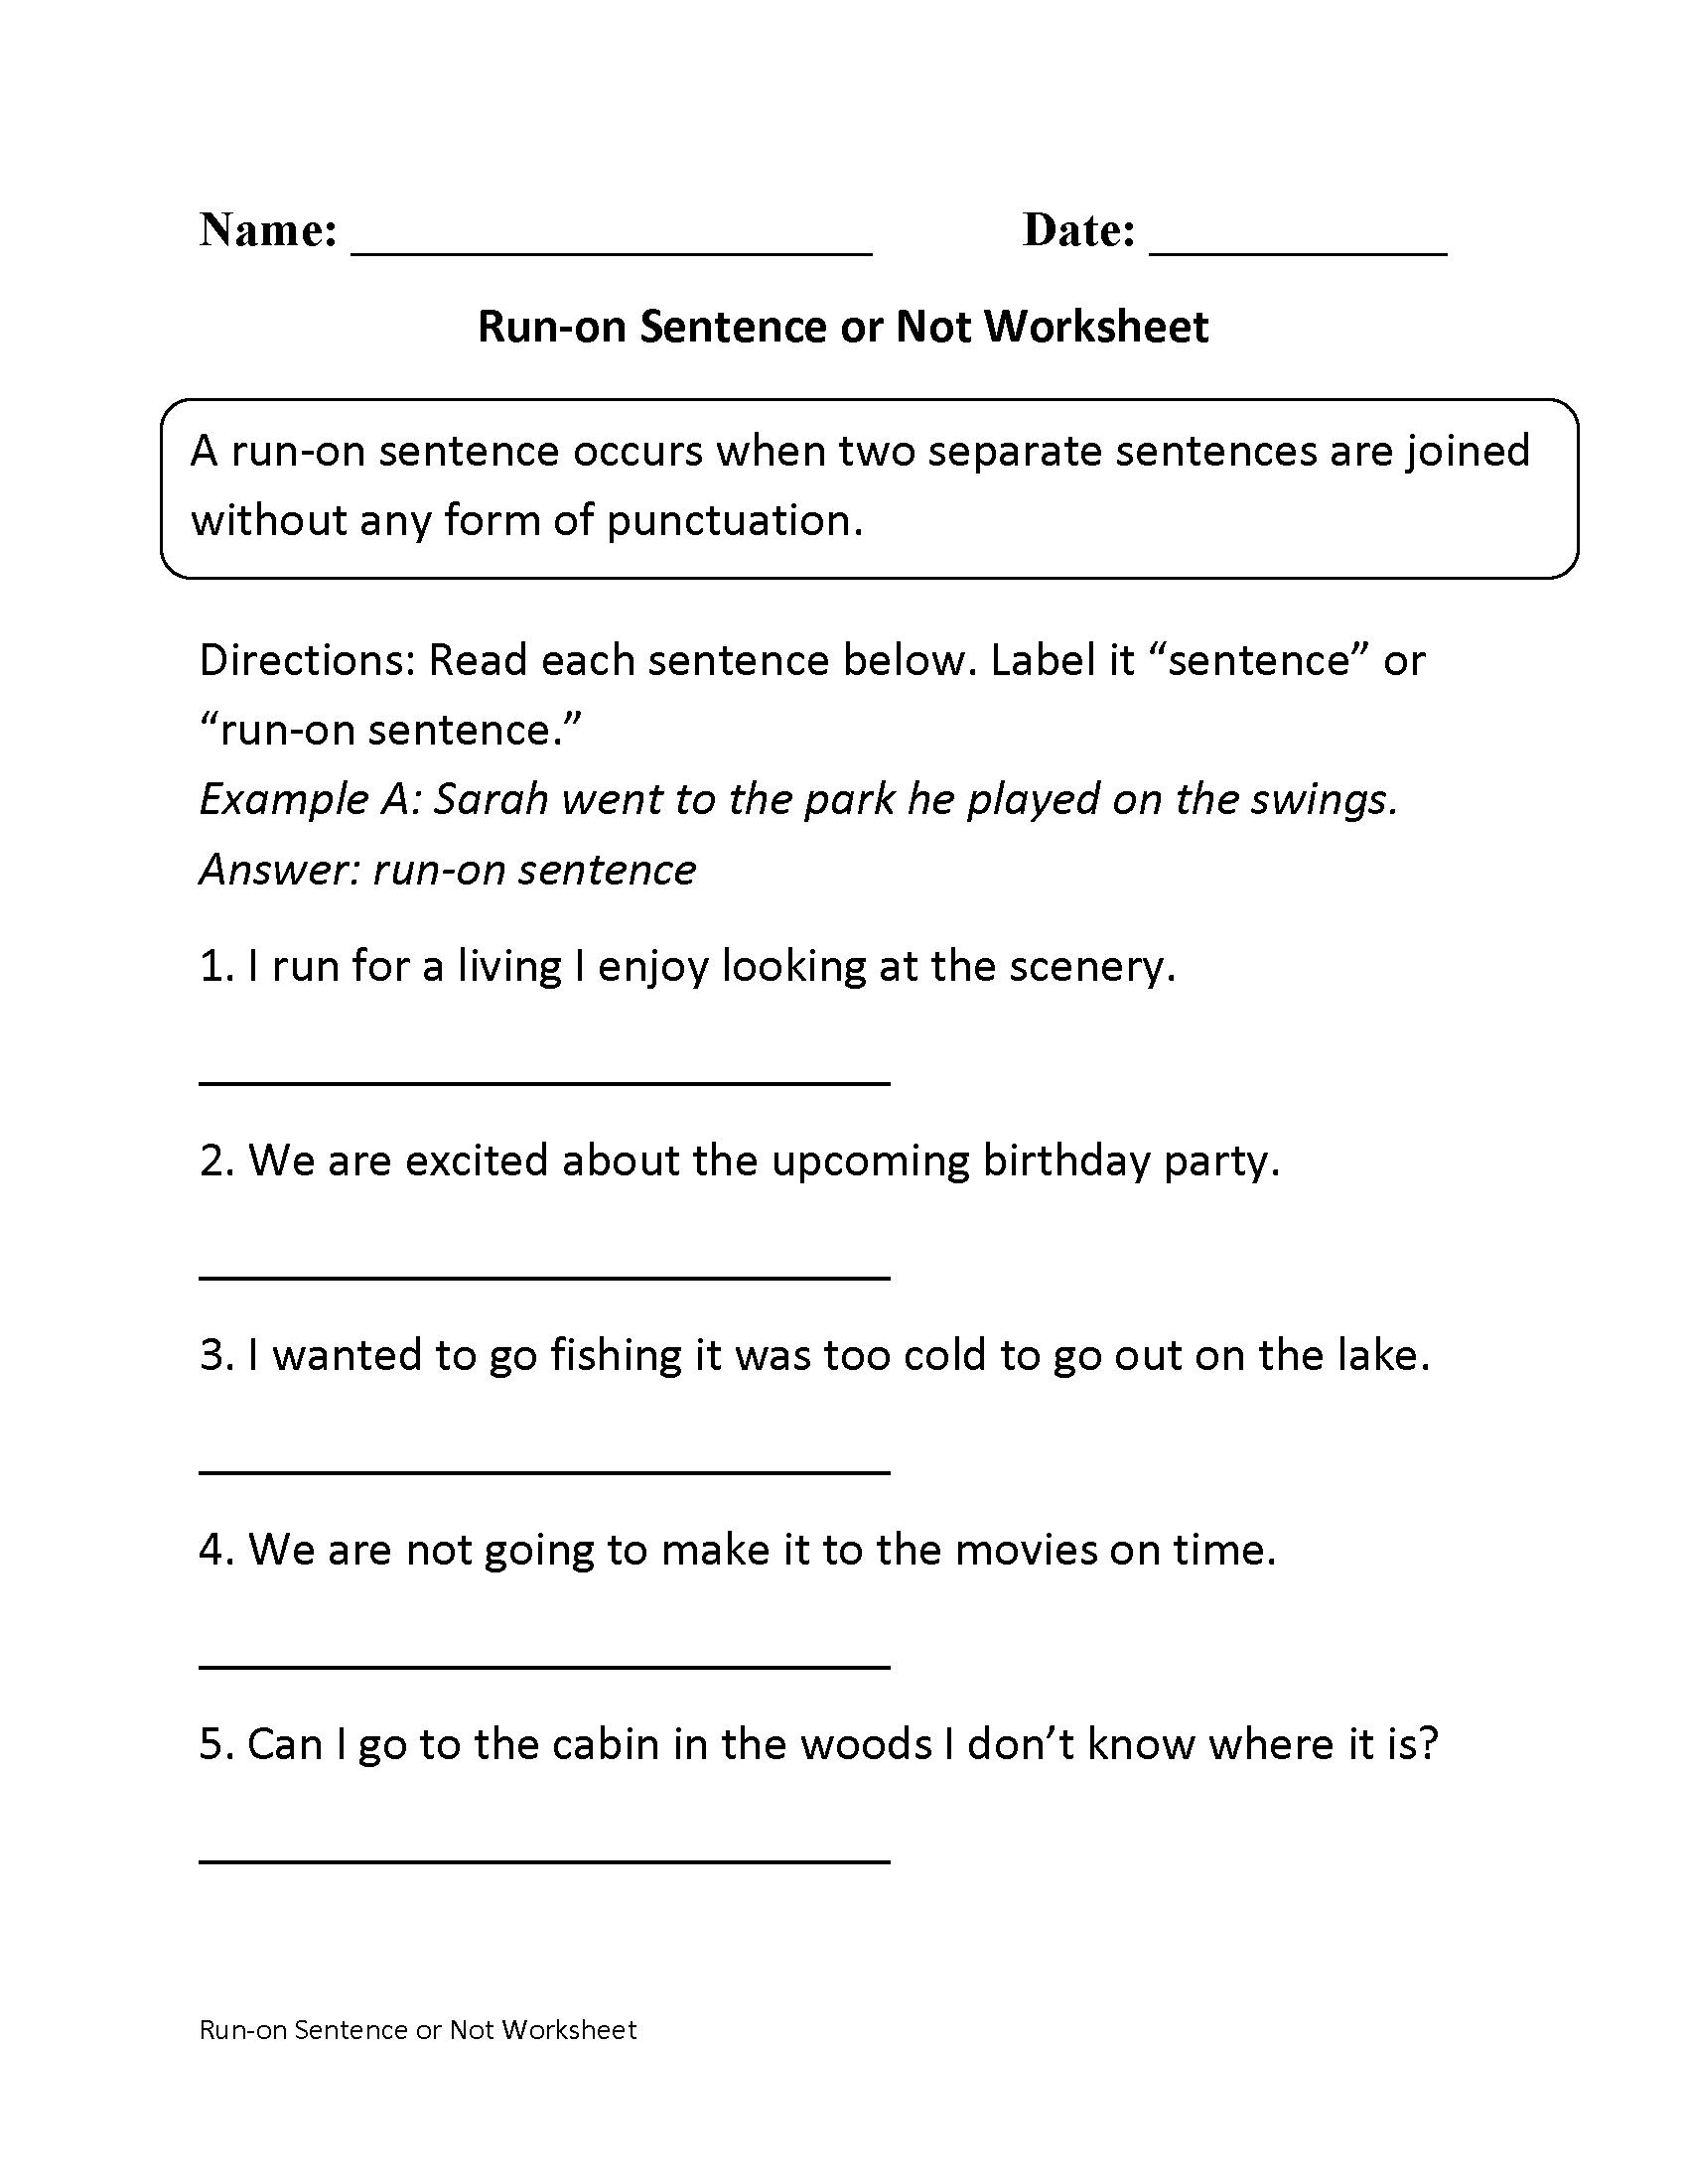 Sentences Worksheets | Run On Sentences Worksheets - Free Printable | Free Printable Sentence Correction Worksheets